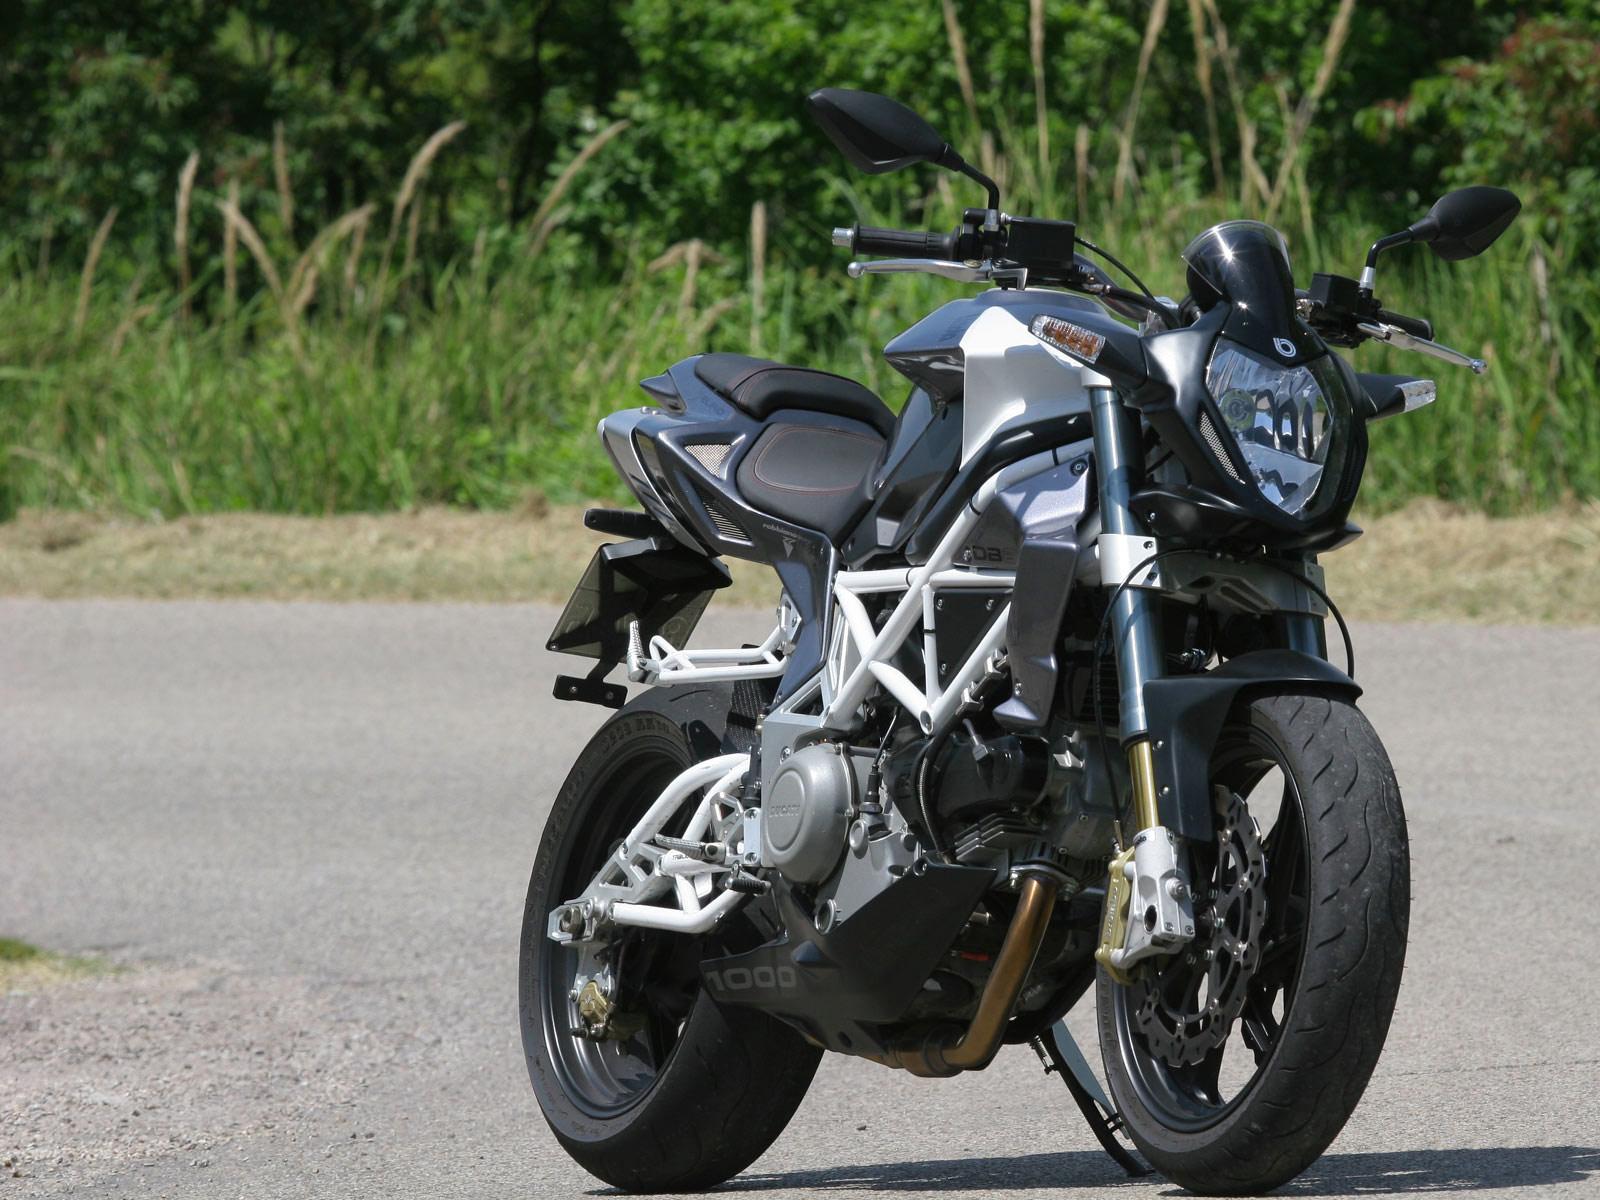 http://2.bp.blogspot.com/-R-uOSQ8X4ug/Tr5Dkp8LB-I/AAAAAAAAEIg/hzStN6QjUGo/s1600/Bimota-DB6-Delirio_motorcycle-desktop-wallpaper_11.jpg